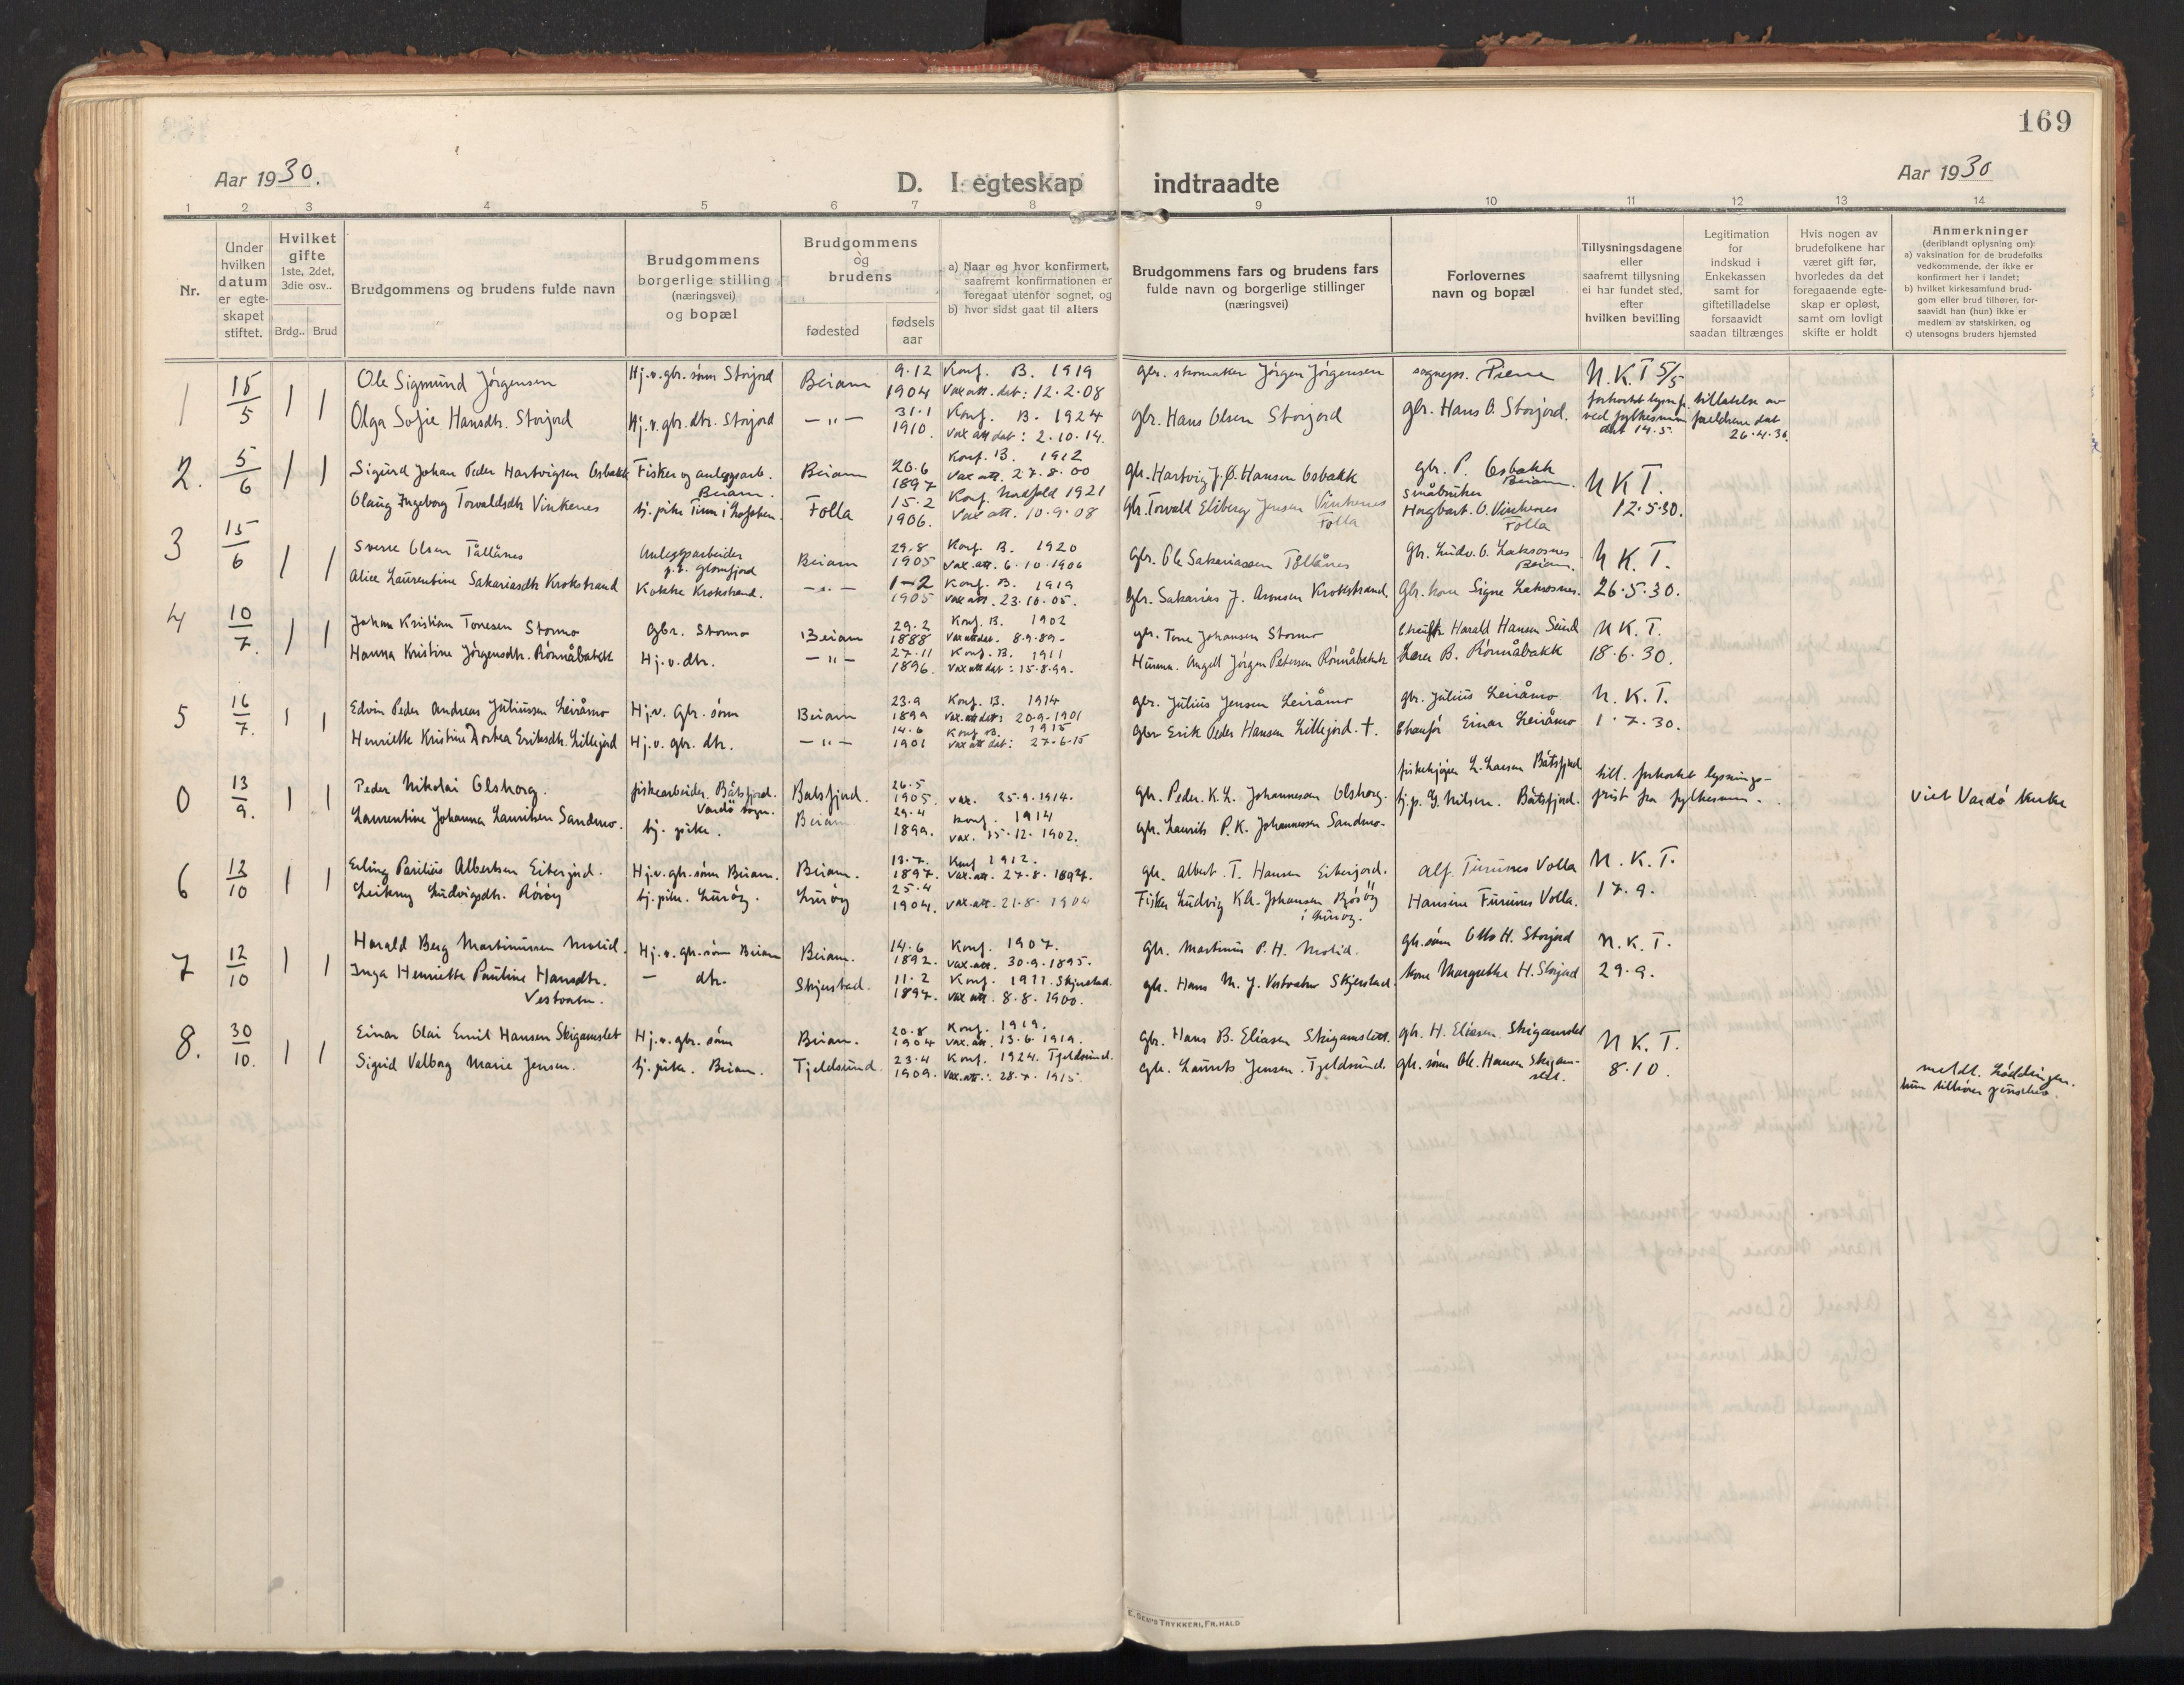 SAT, Ministerialprotokoller, klokkerbøker og fødselsregistre - Nordland, 846/L0650: Ministerialbok nr. 846A08, 1916-1935, s. 169